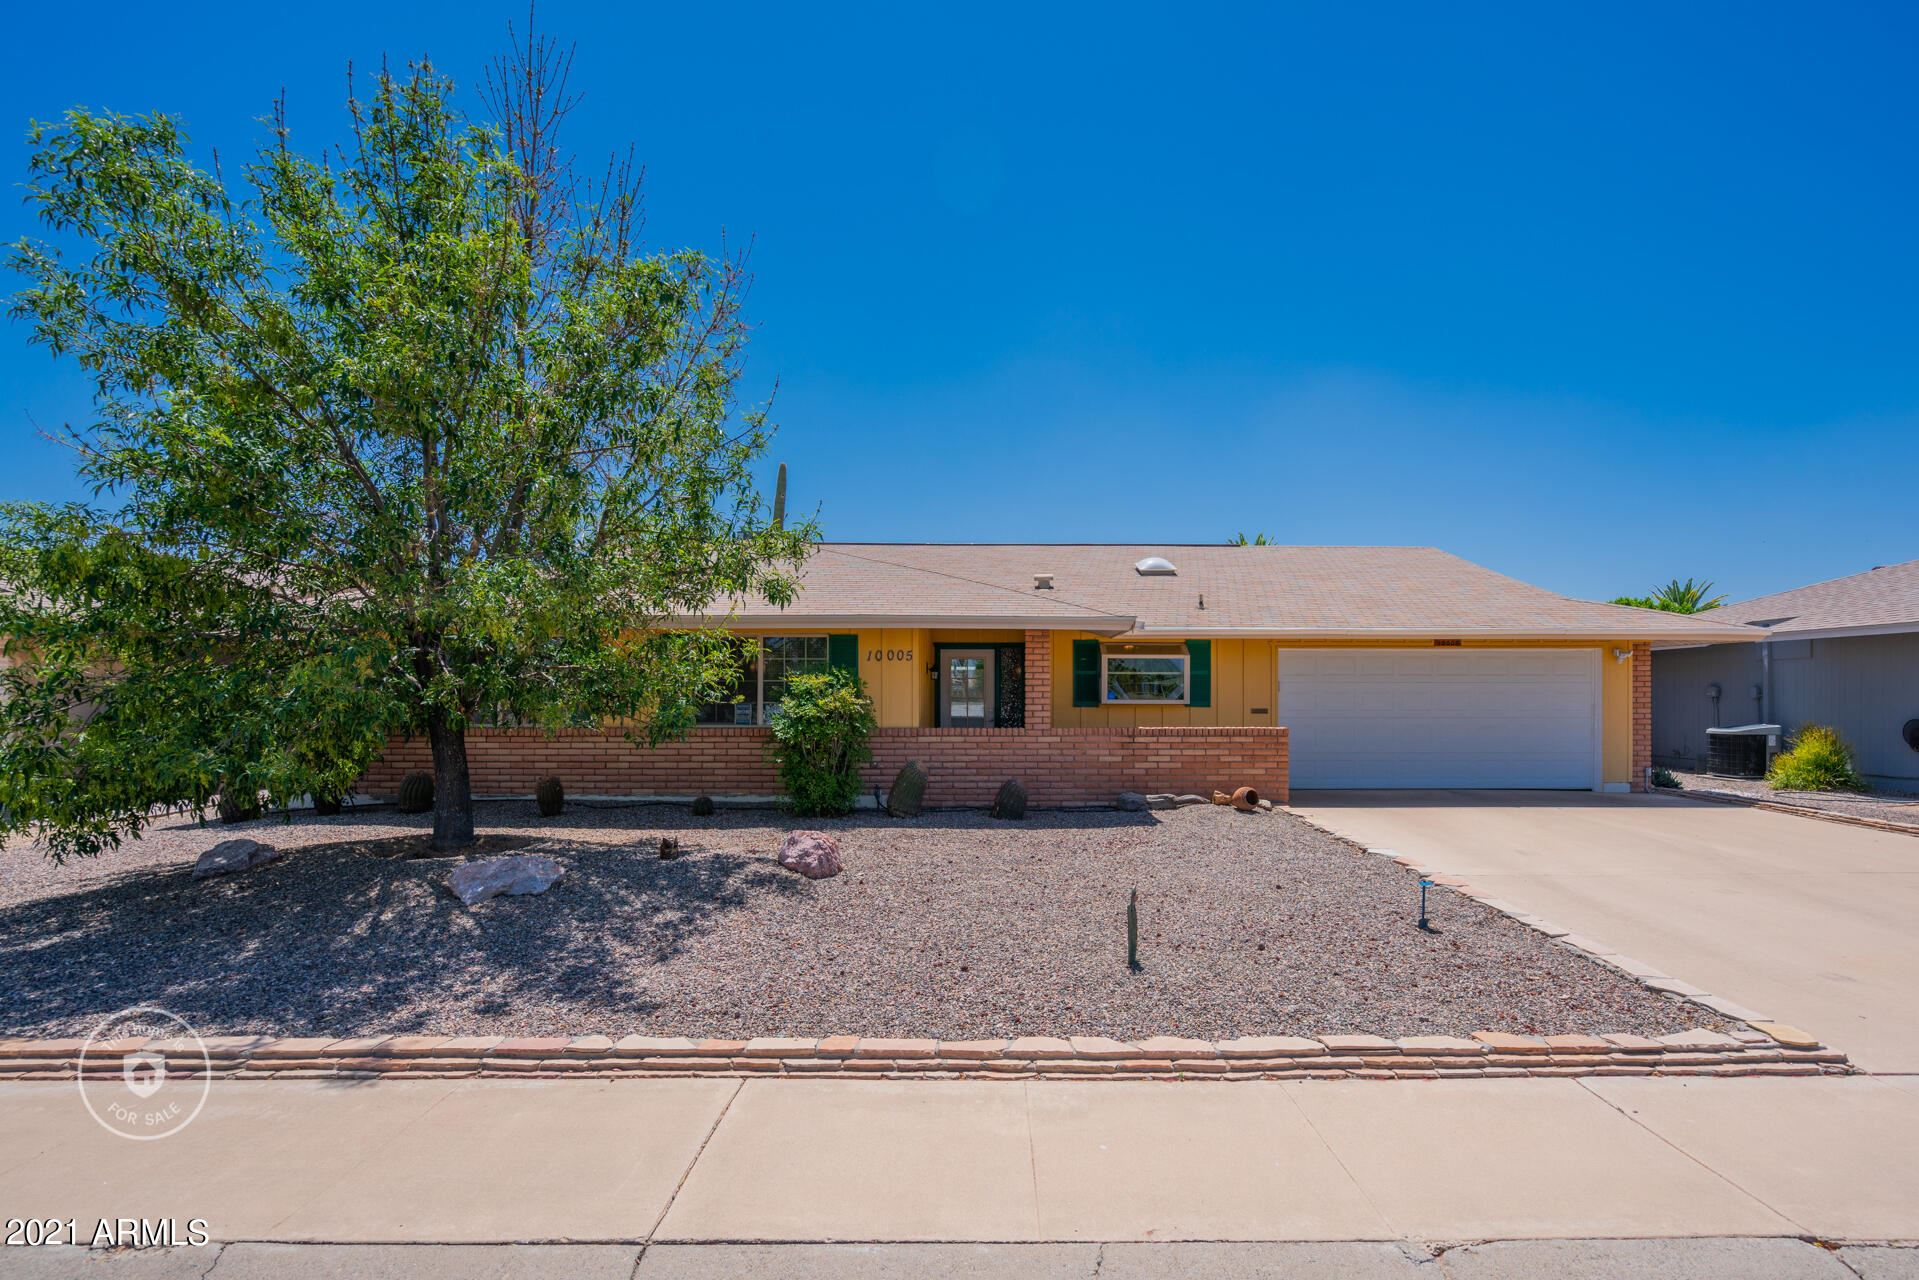 Photo of 10005 W CAMEO Drive, Sun City, AZ 85351 (MLS # 6230854)